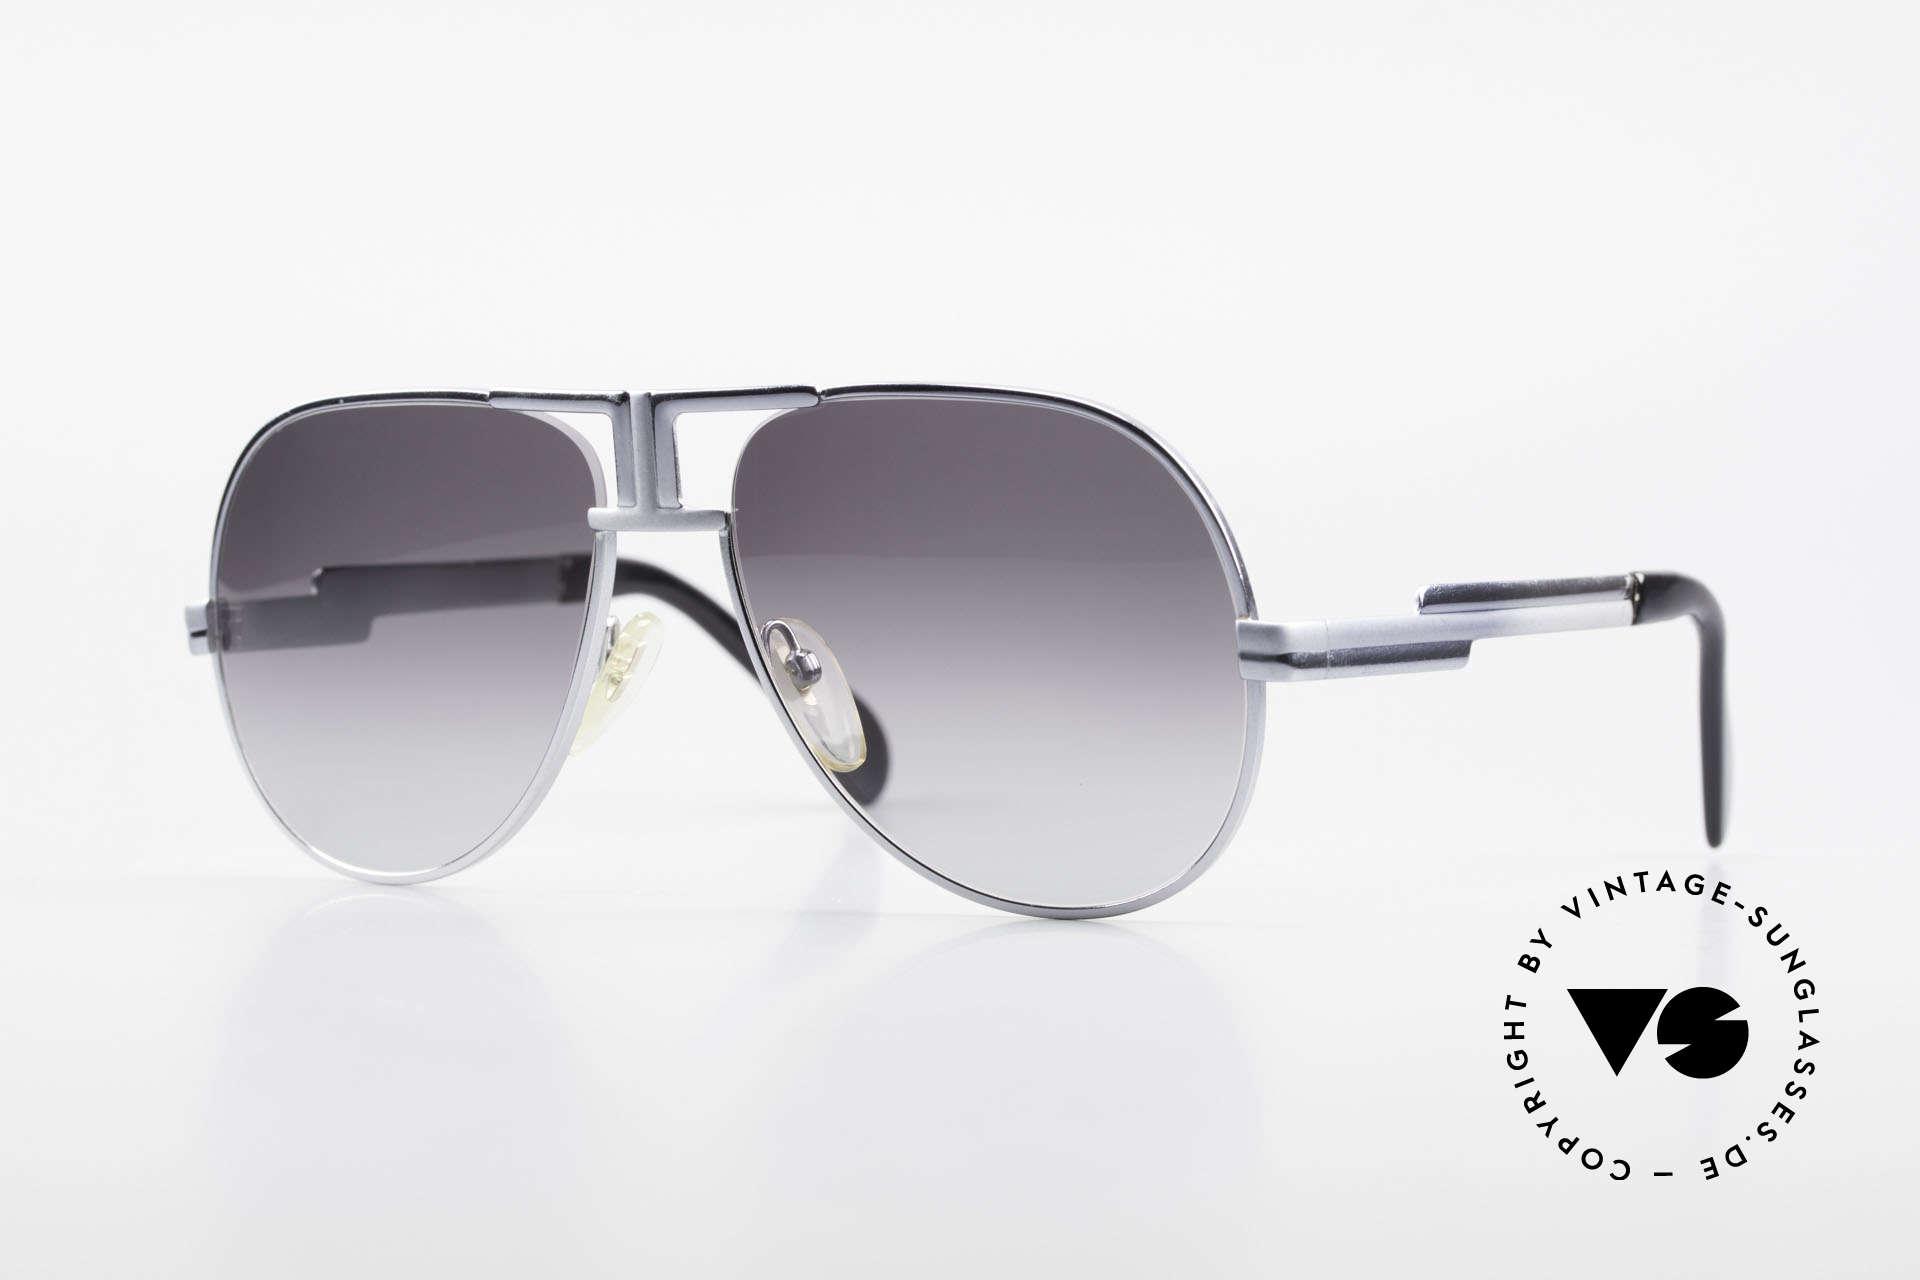 Cazal 702 Ultra Rare 70's Sunglasses, ultra rare CAZAL men's sunglasses of the 1970's, Made for Men